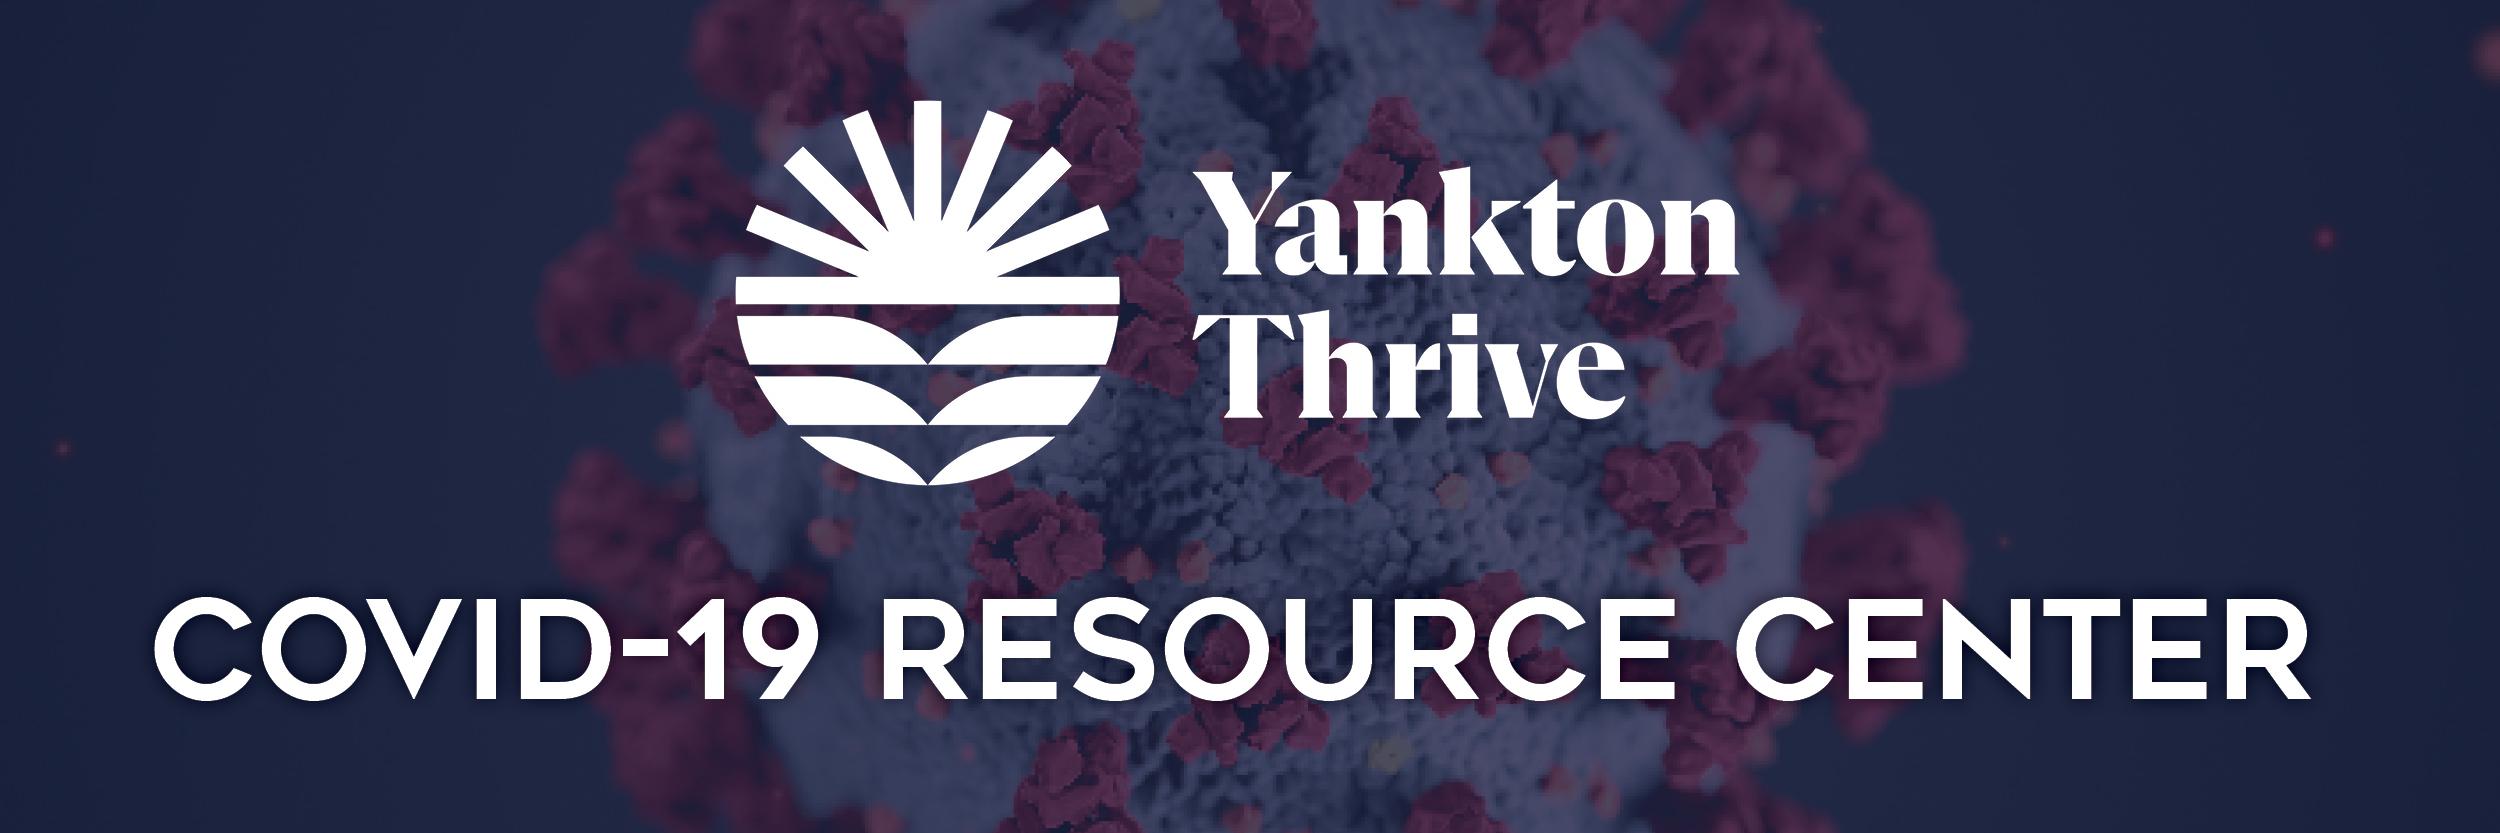 Yankton Thrive COVID19 Resource Center.jpg